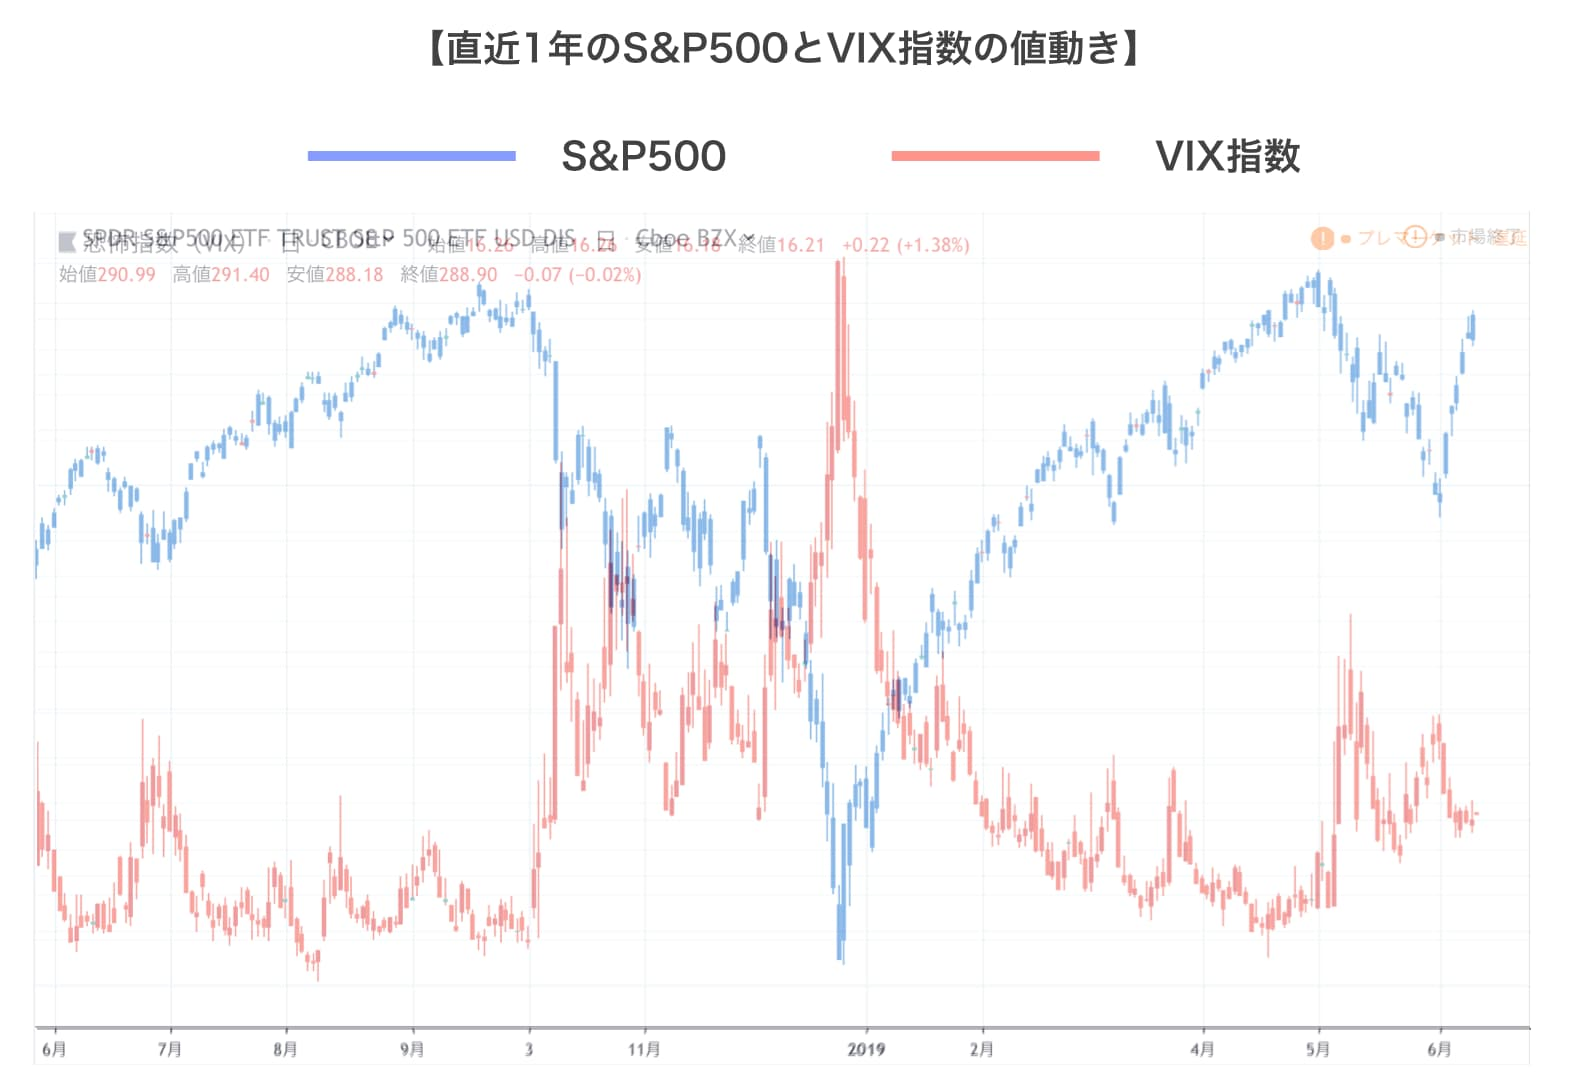 S&P500とVIXのチャート